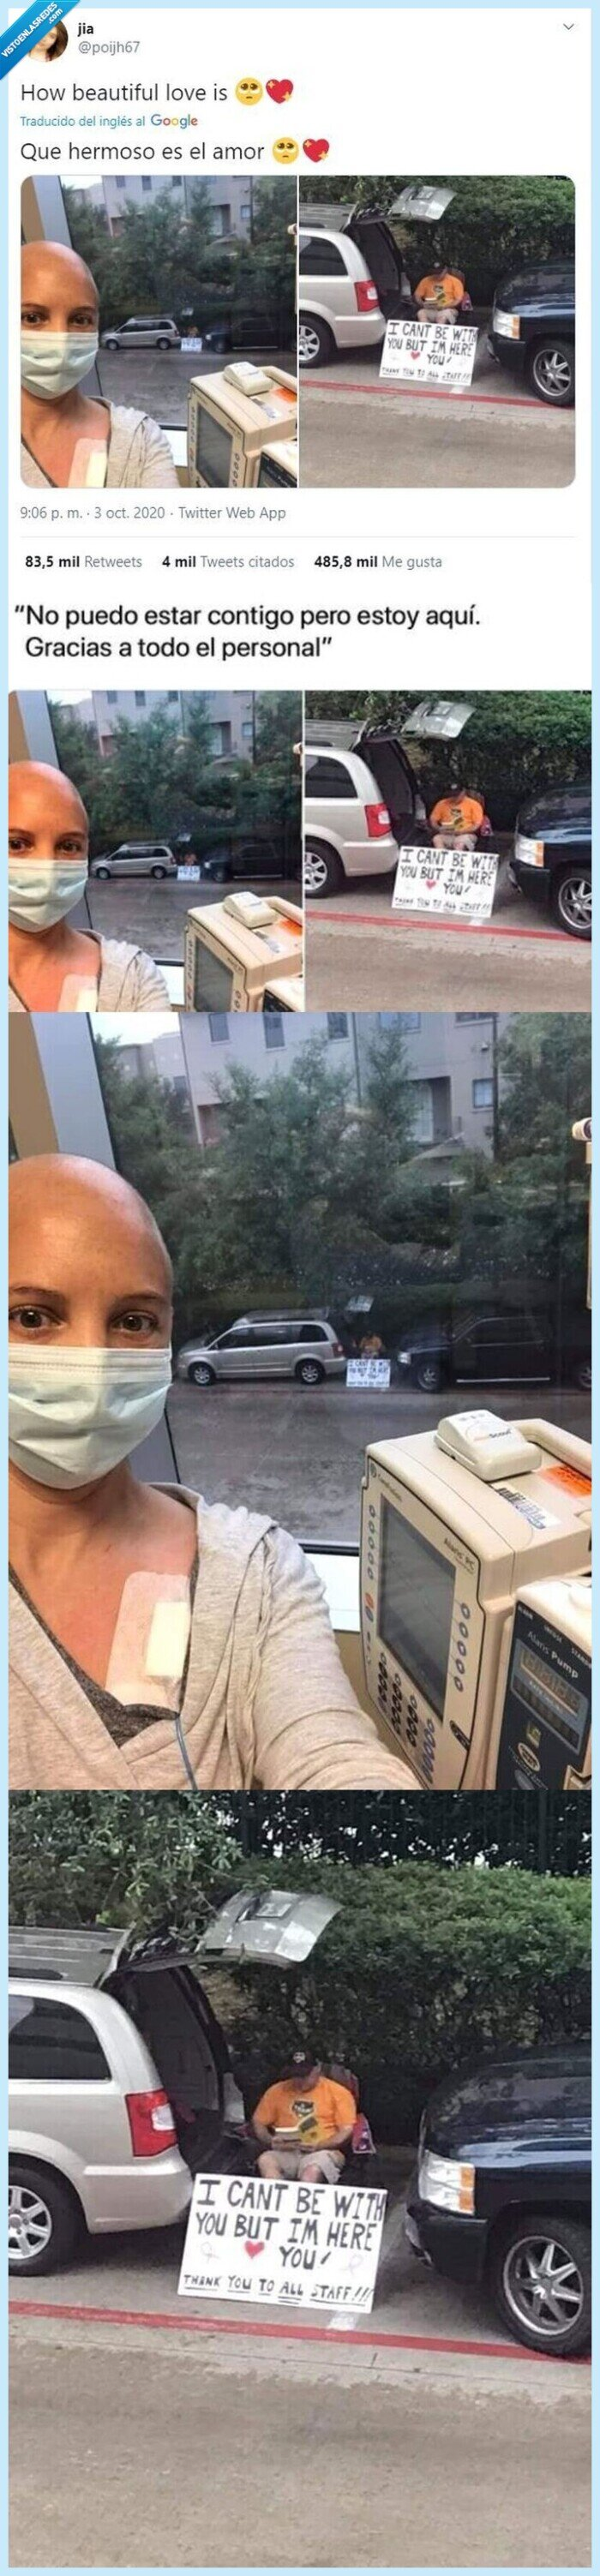 cáncer,hija,hospital,lucha,padre